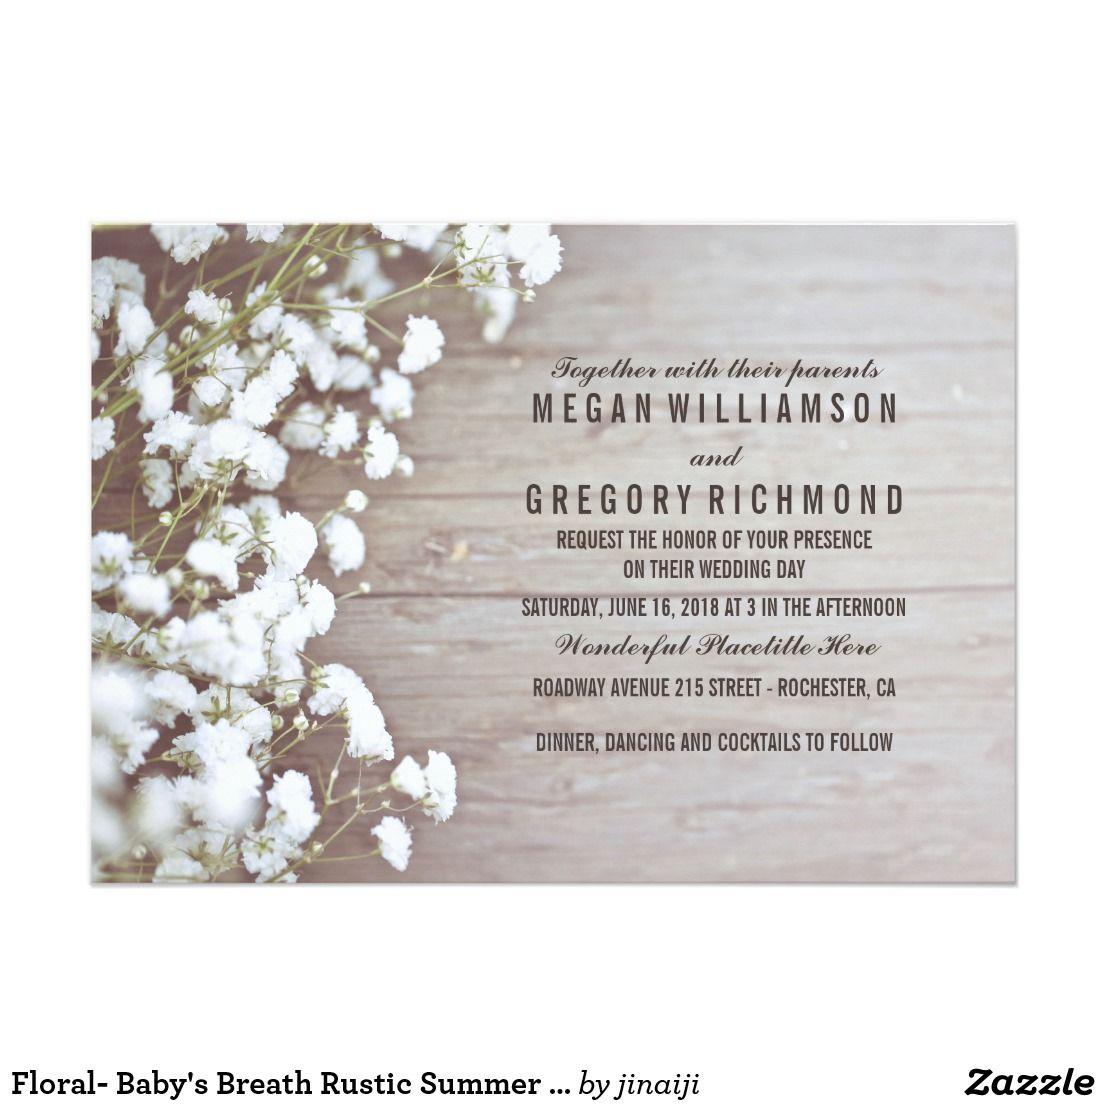 Floral Babys Breath Rustic Summer Simple Wedding Card